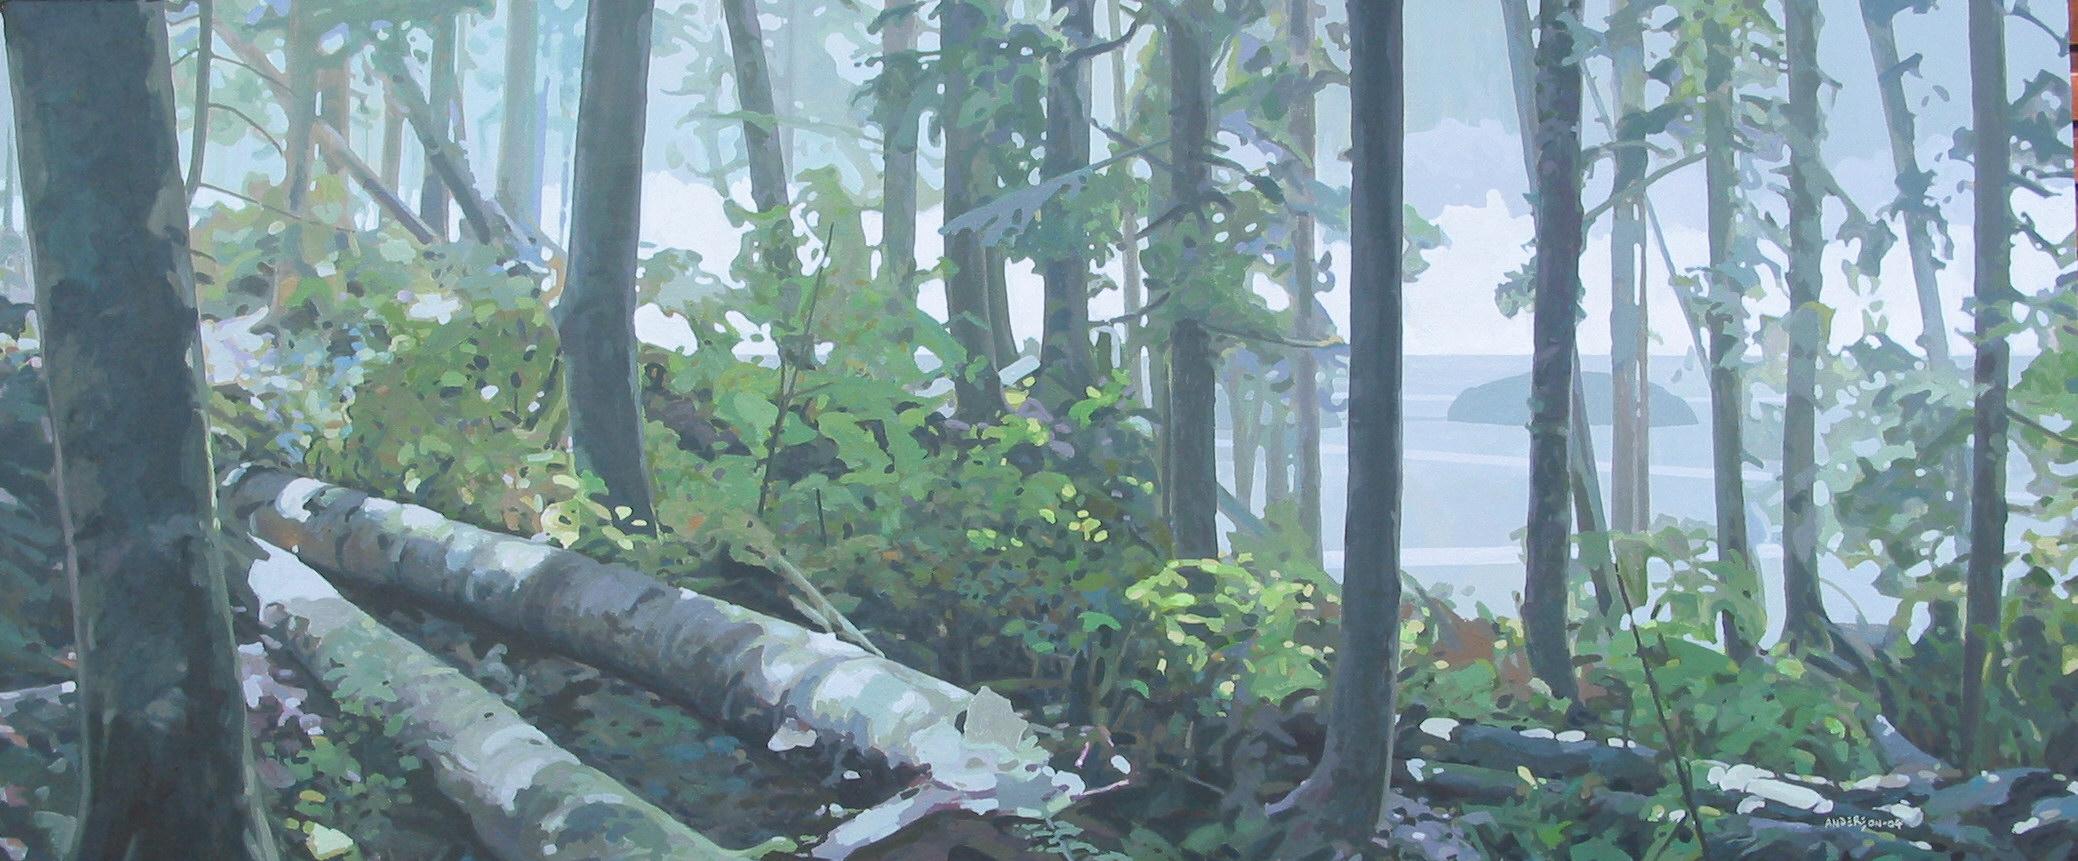 Clayton Anderson, Clayton Anderson Art, J Clayton Anderson, J Clayton Anderson Art, Artist, West Coast Artist, West Coast, West Coast Art, Canadian Art, Canadian Artist, Landscape Artist, Canadian Landscape Artist, Acrylic, Acrylic Painting,